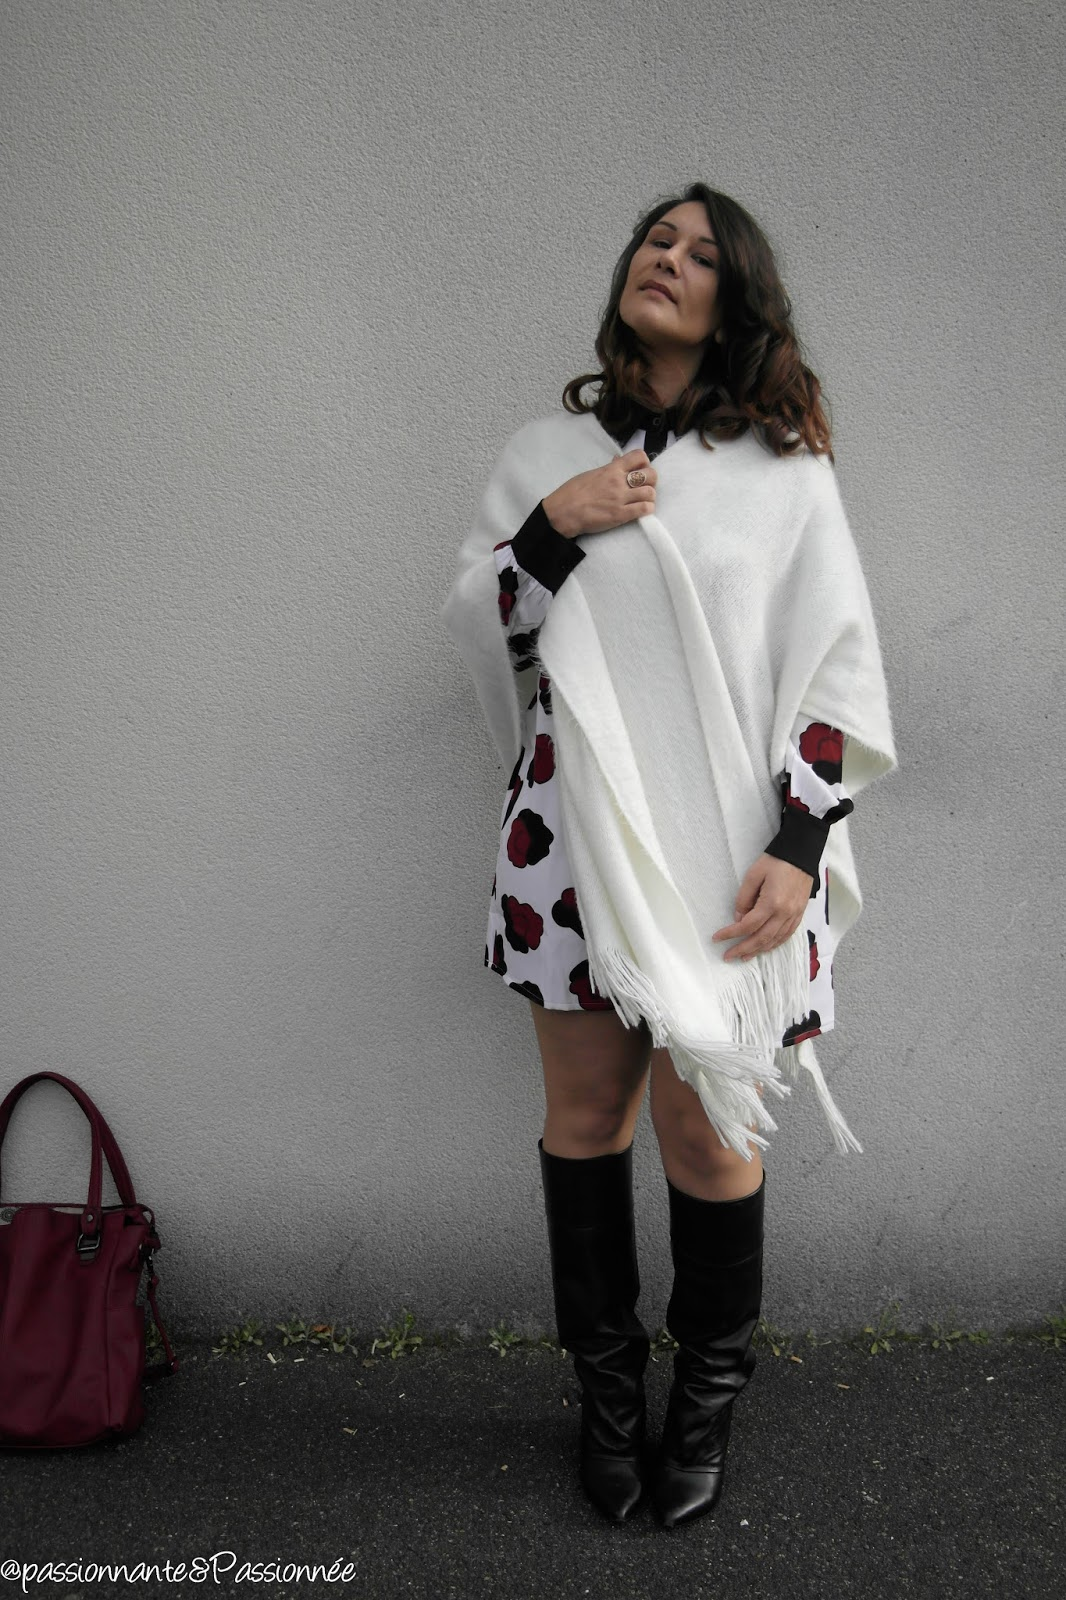 porter le poncho blanc et robe